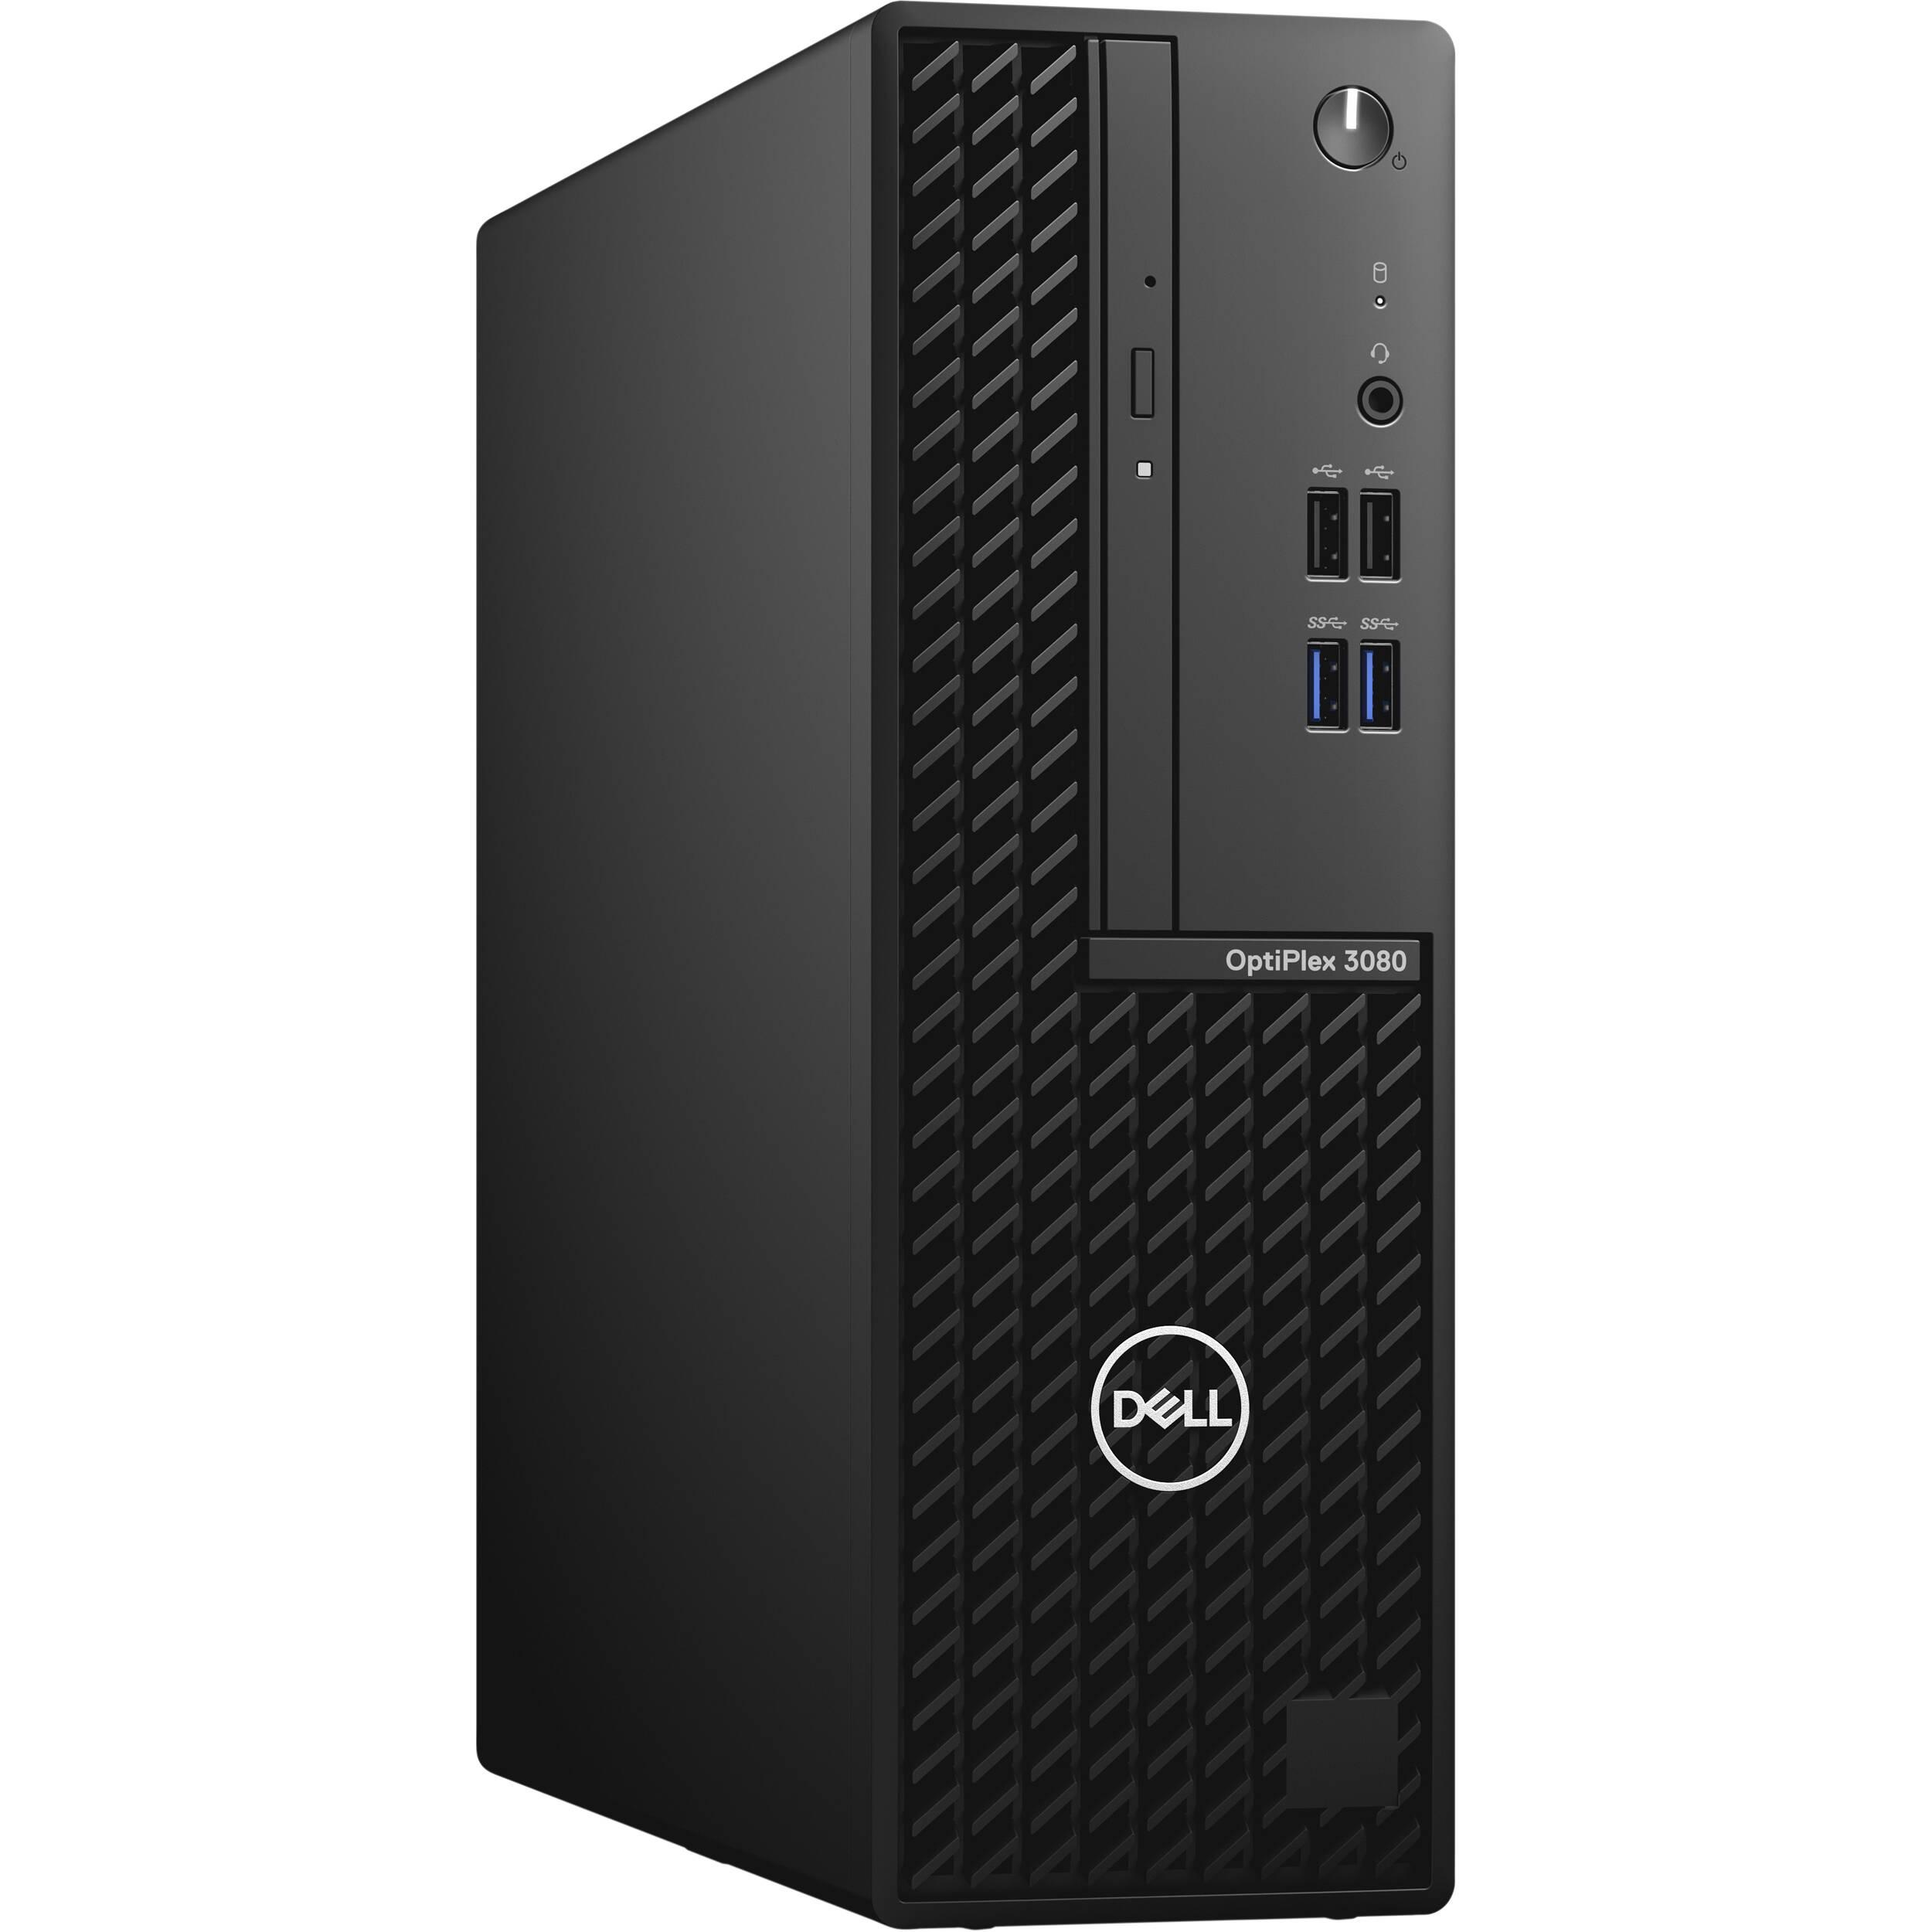 Máy tính để bàn Dell OPTIPLEX 3080SFF Intel® Core i5-10500 (6 Cores / 12MB / 12T / 3.1GHz to 4.5GHz/65W); HDD 1TB 7200 rpm SATA, 4GB 2666 MHz DDR4/Fedora/1 year Prosupport